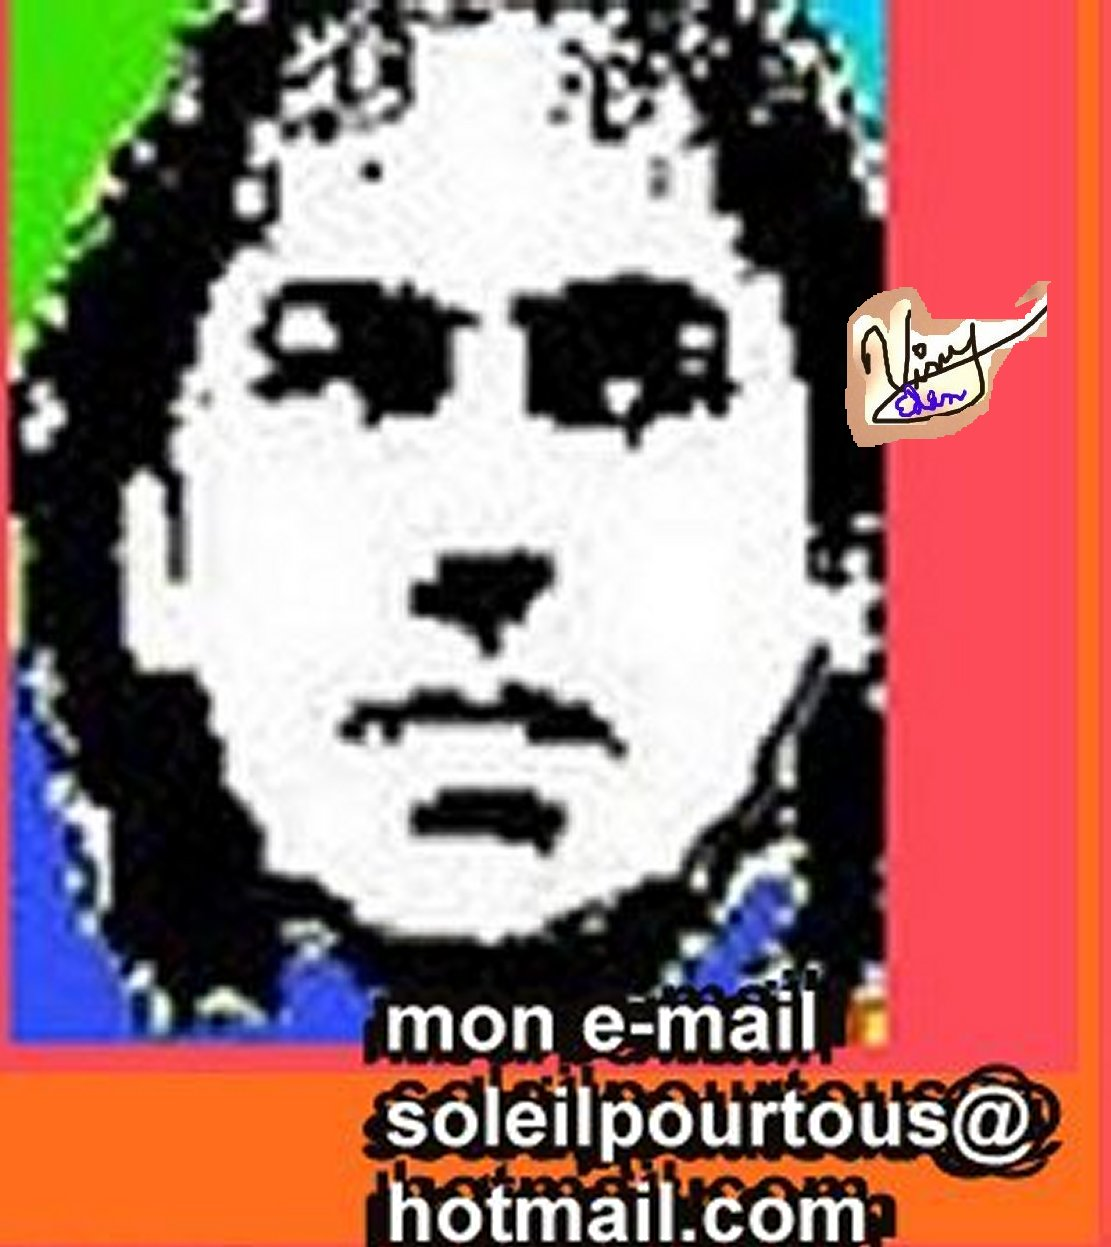 http://3.bp.blogspot.com/_U9VdNI6cmZI/TBKwK9R3HvI/AAAAAAAAEoY/77I_WOk4DdA/s1600/ZZZZZZZZZZZZZZZZZZZZZZZZ+ICONE+REDG.jpg